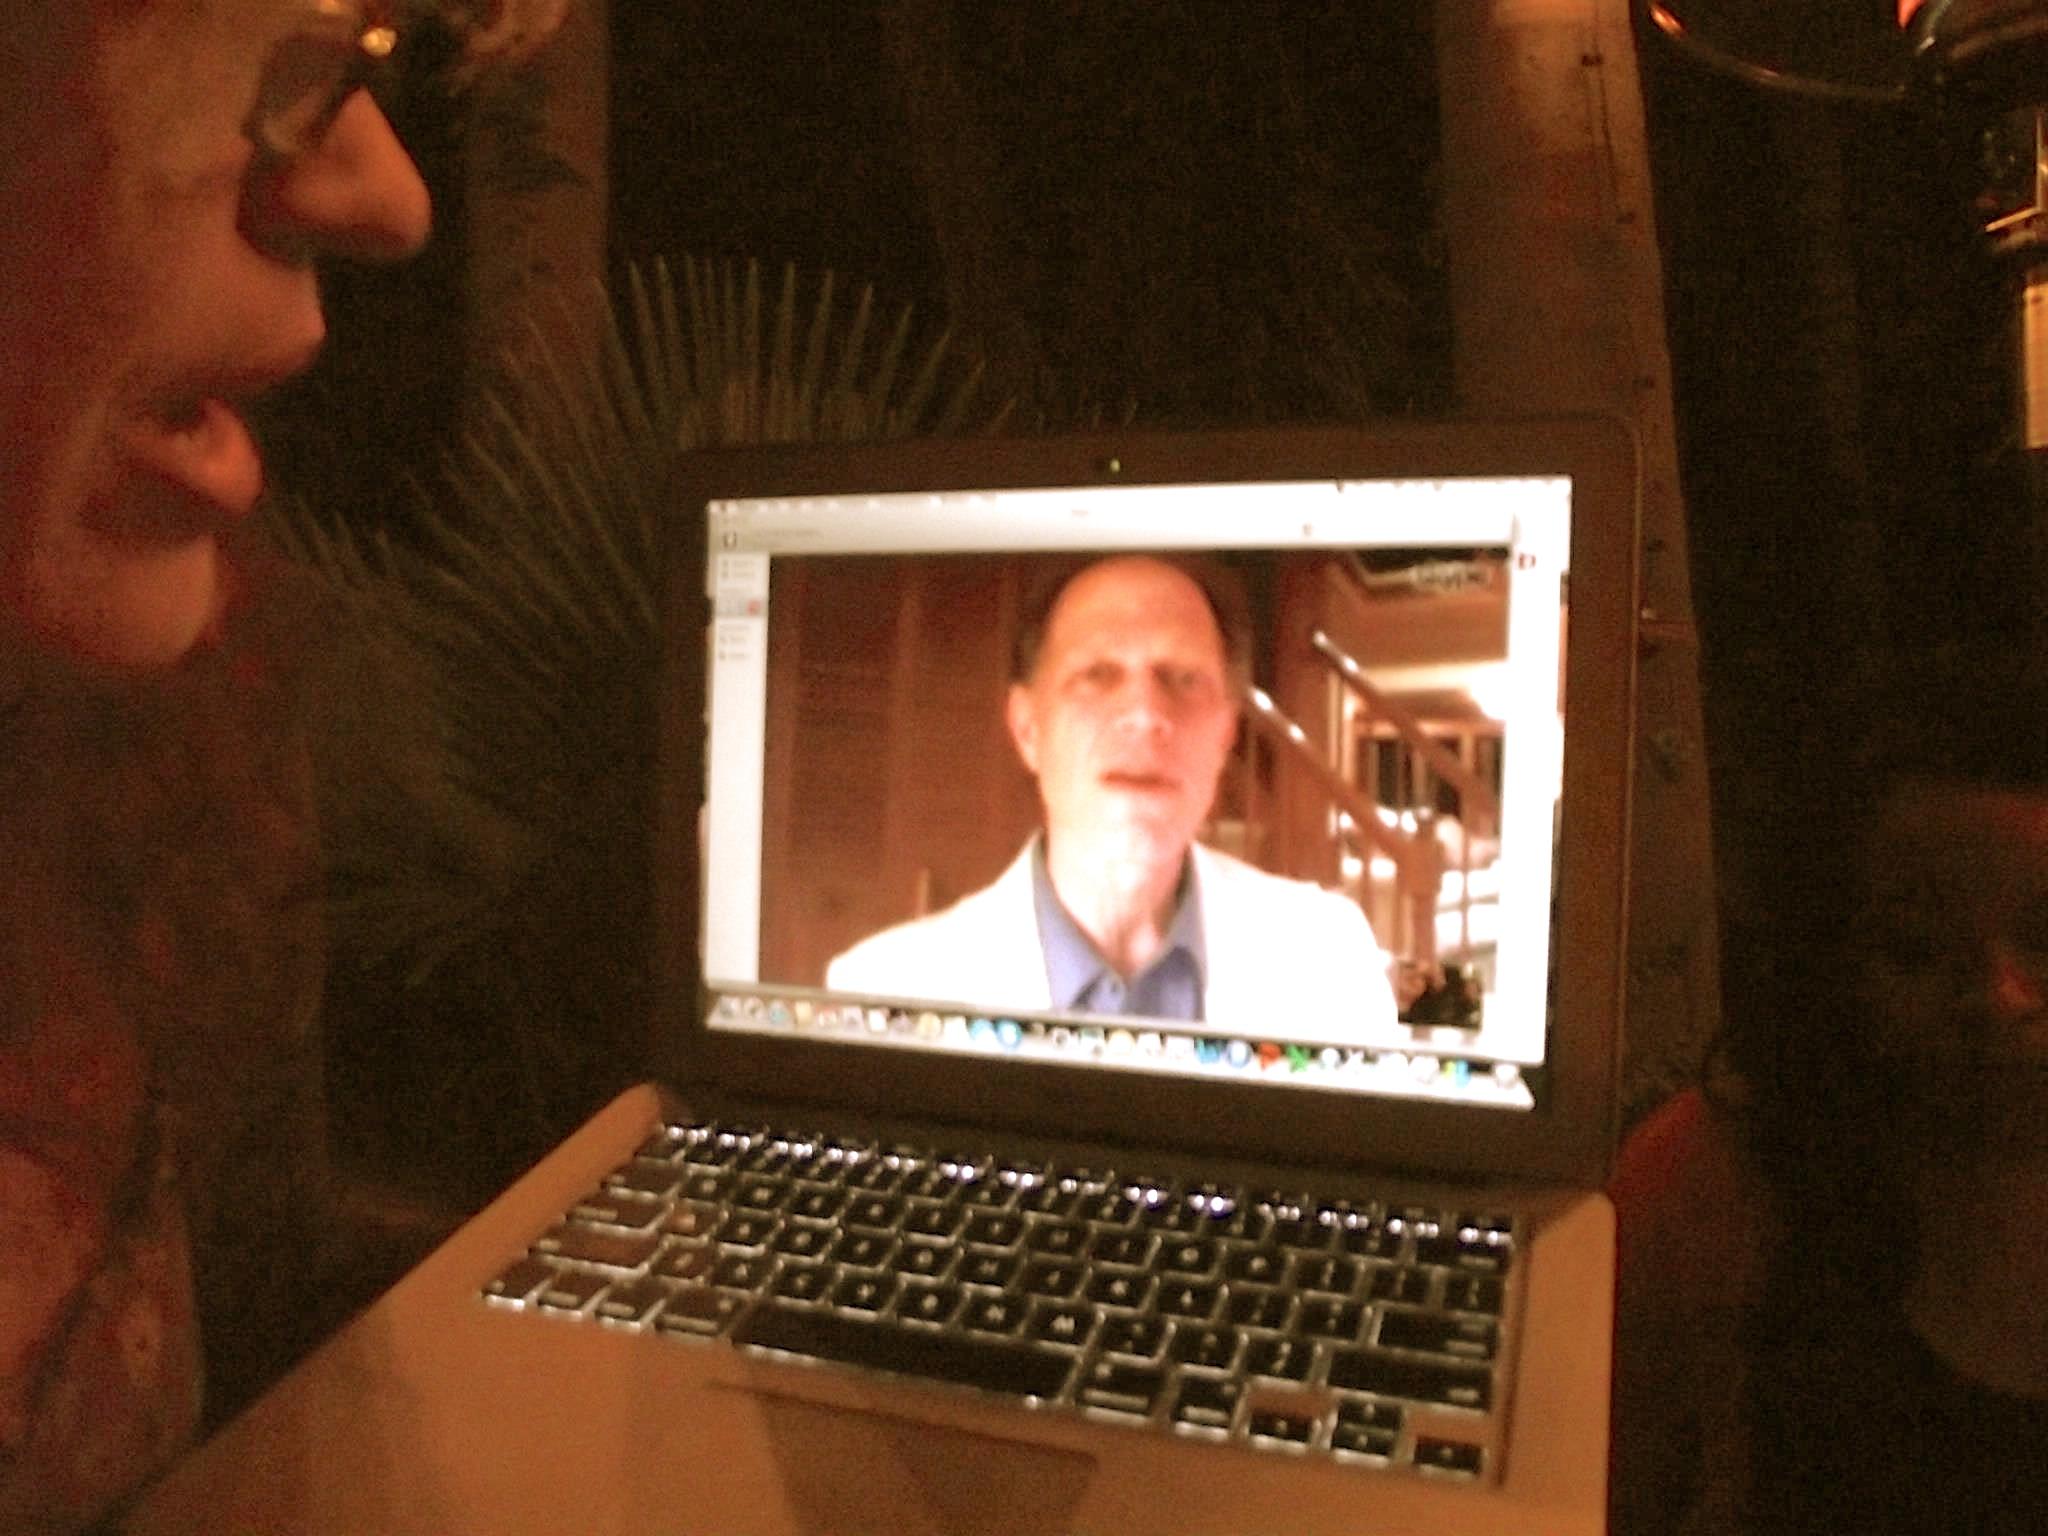 Jeff via Skype